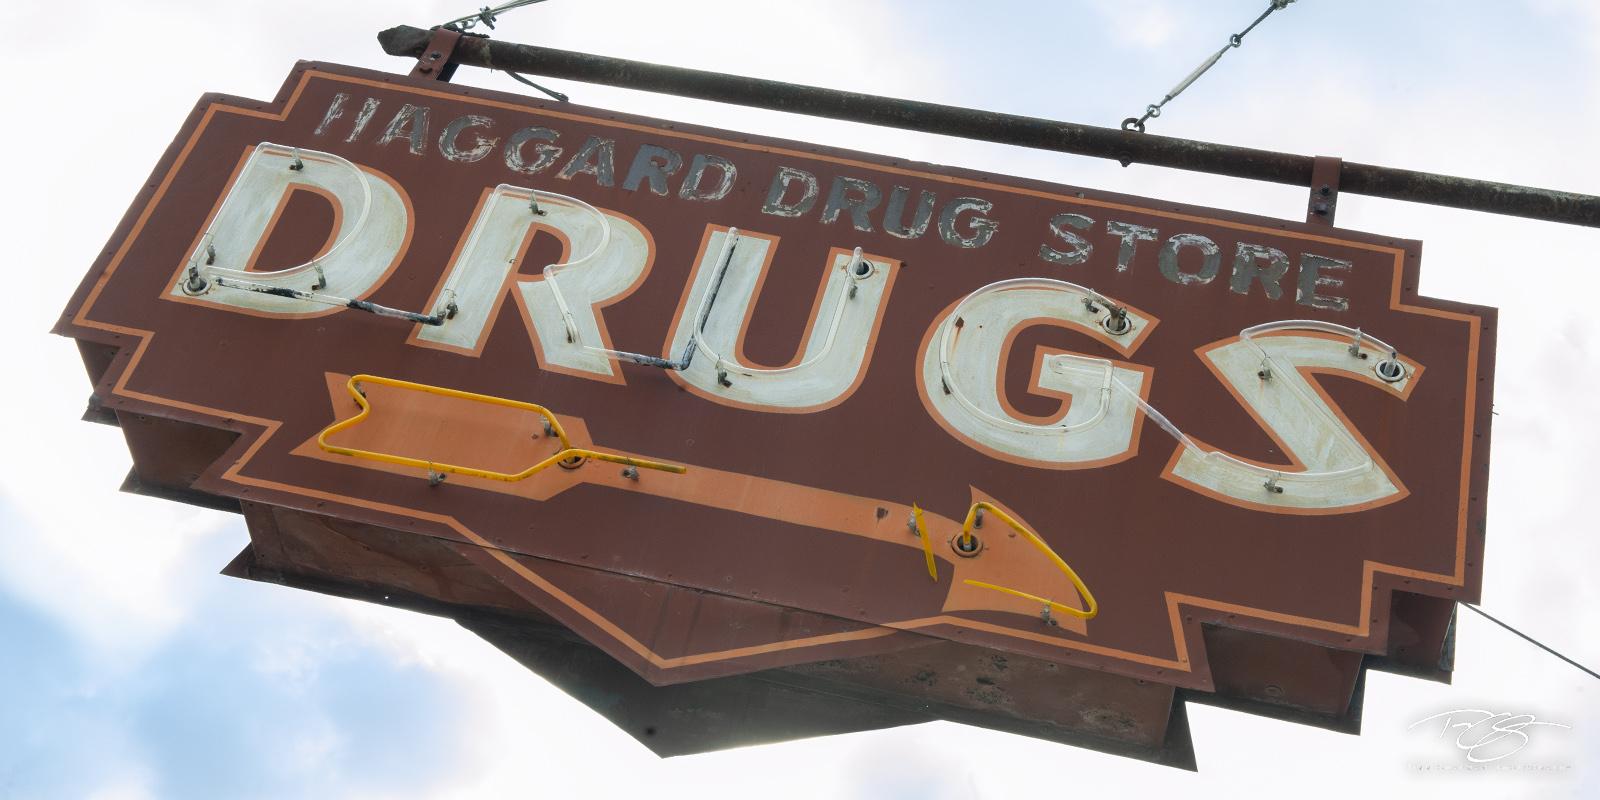 haggard drug store, haggard drugs, drugs, neon sign, neon, sign, rusty, vintage sign, arrow, mississippi, clarksdale, panorama, rust, peeling paint, orange, photo